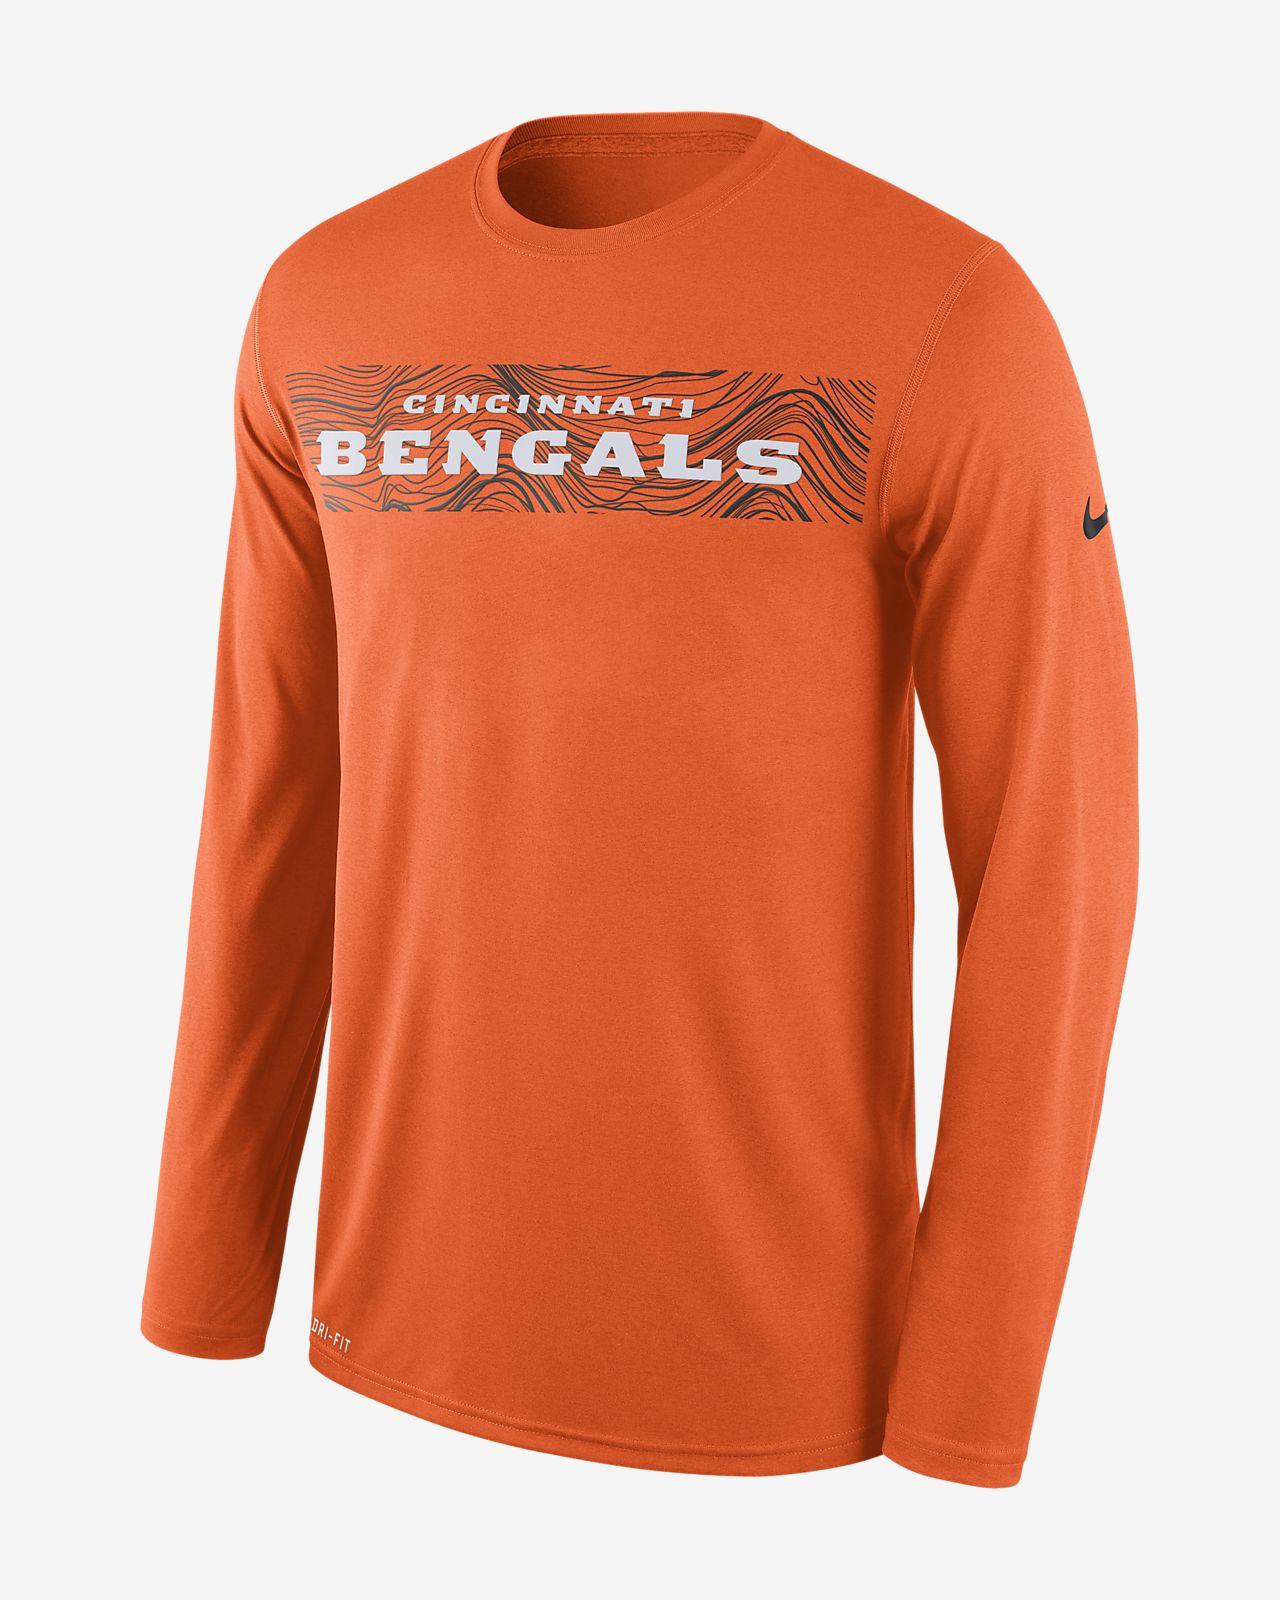 Nike Dri-FIT Legend Seismic (NFL Bengals) Men s Long Sleeve T-Shirt ... 8fbd3690b